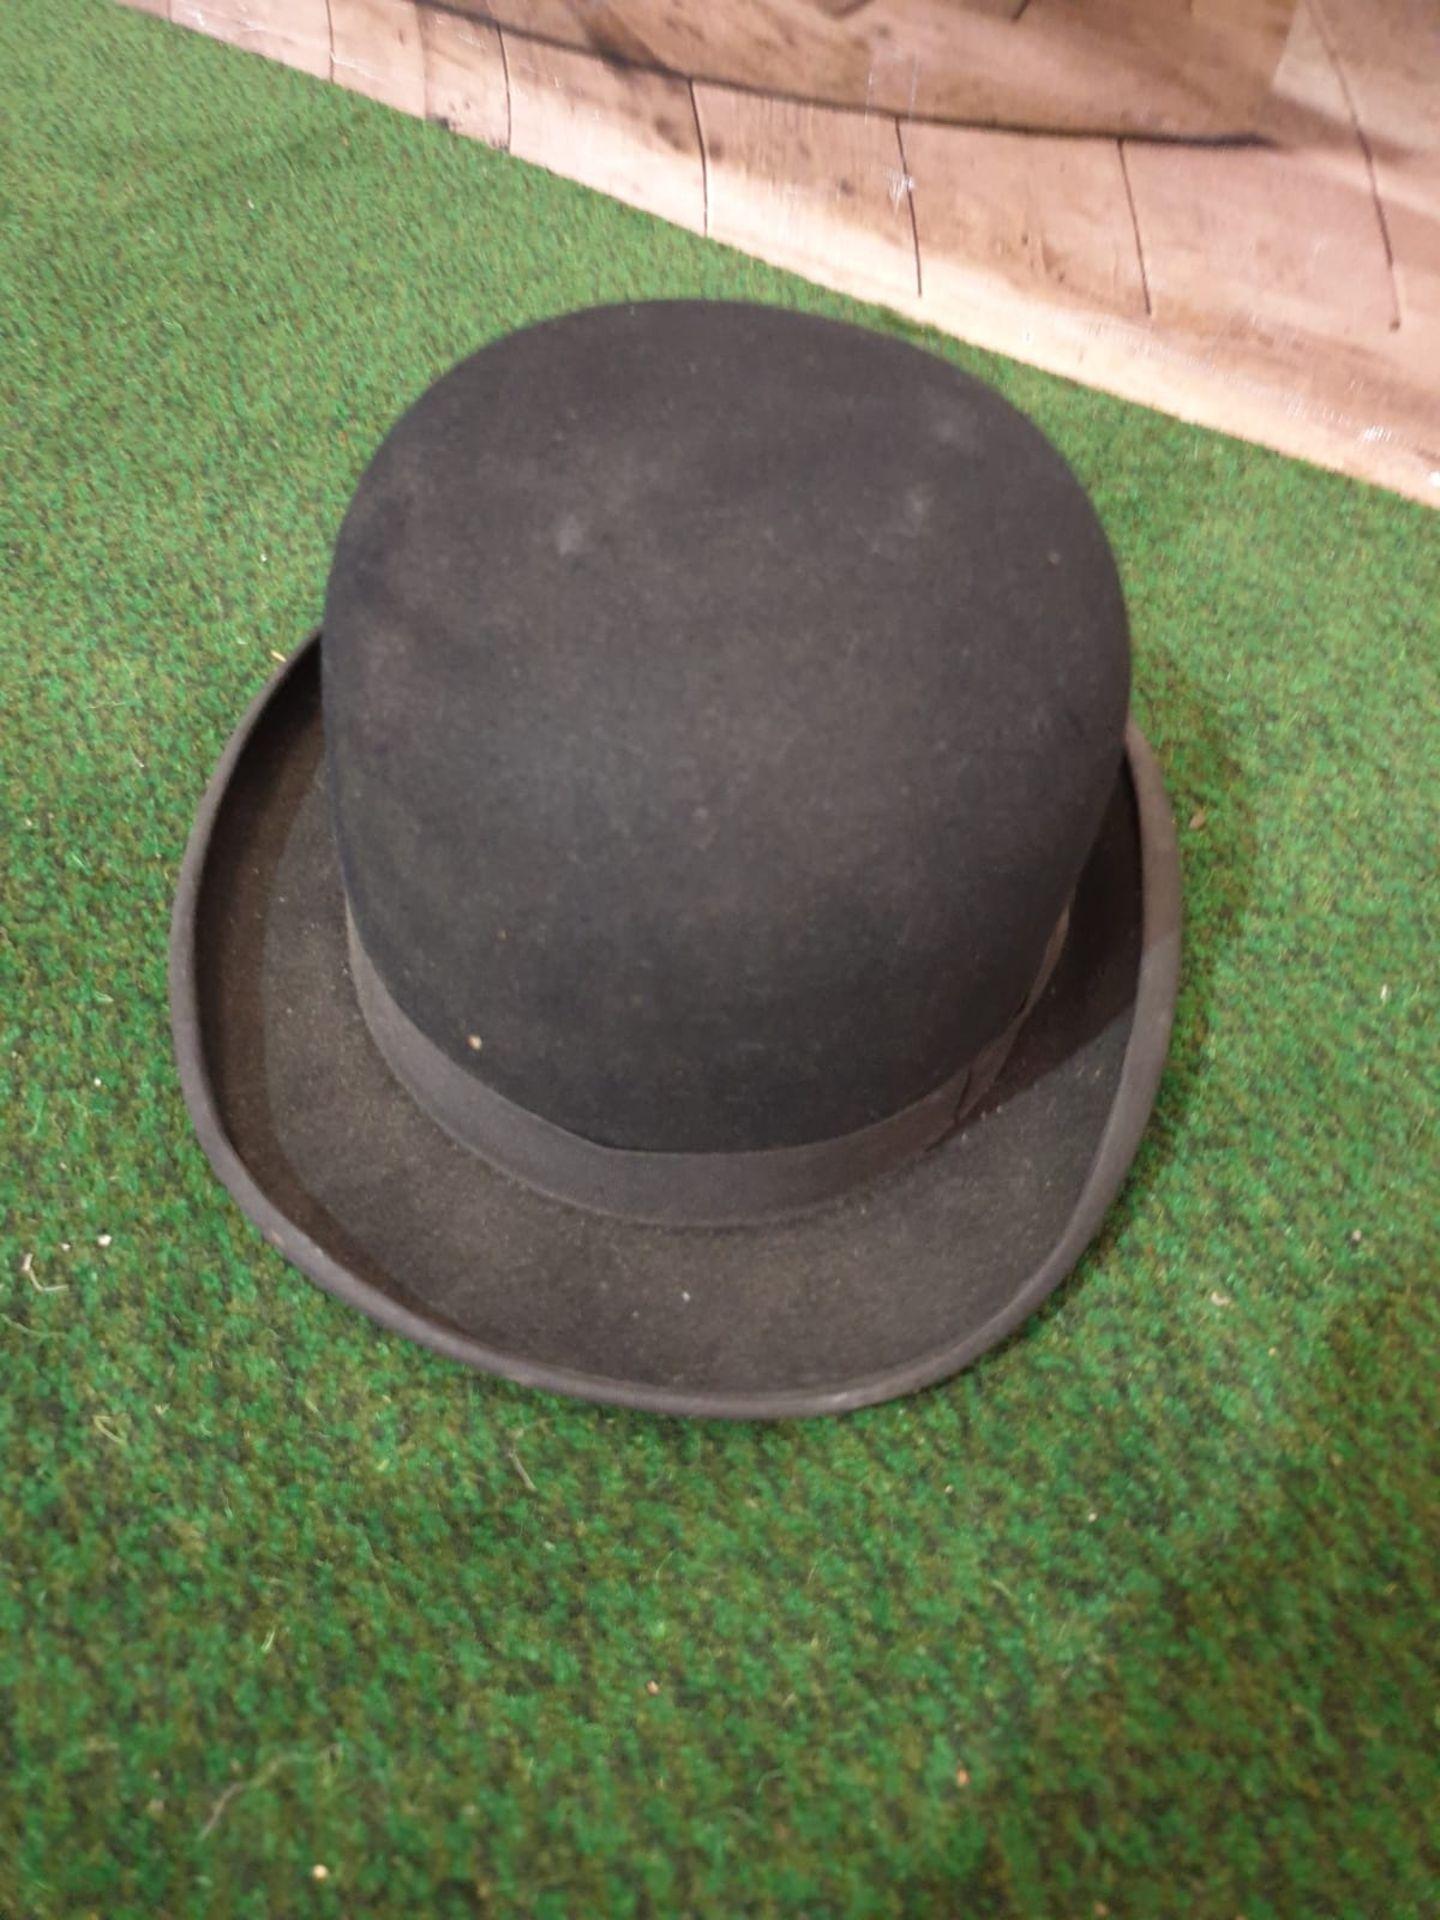 Vintage Dunns & Co London mens black bowler hat